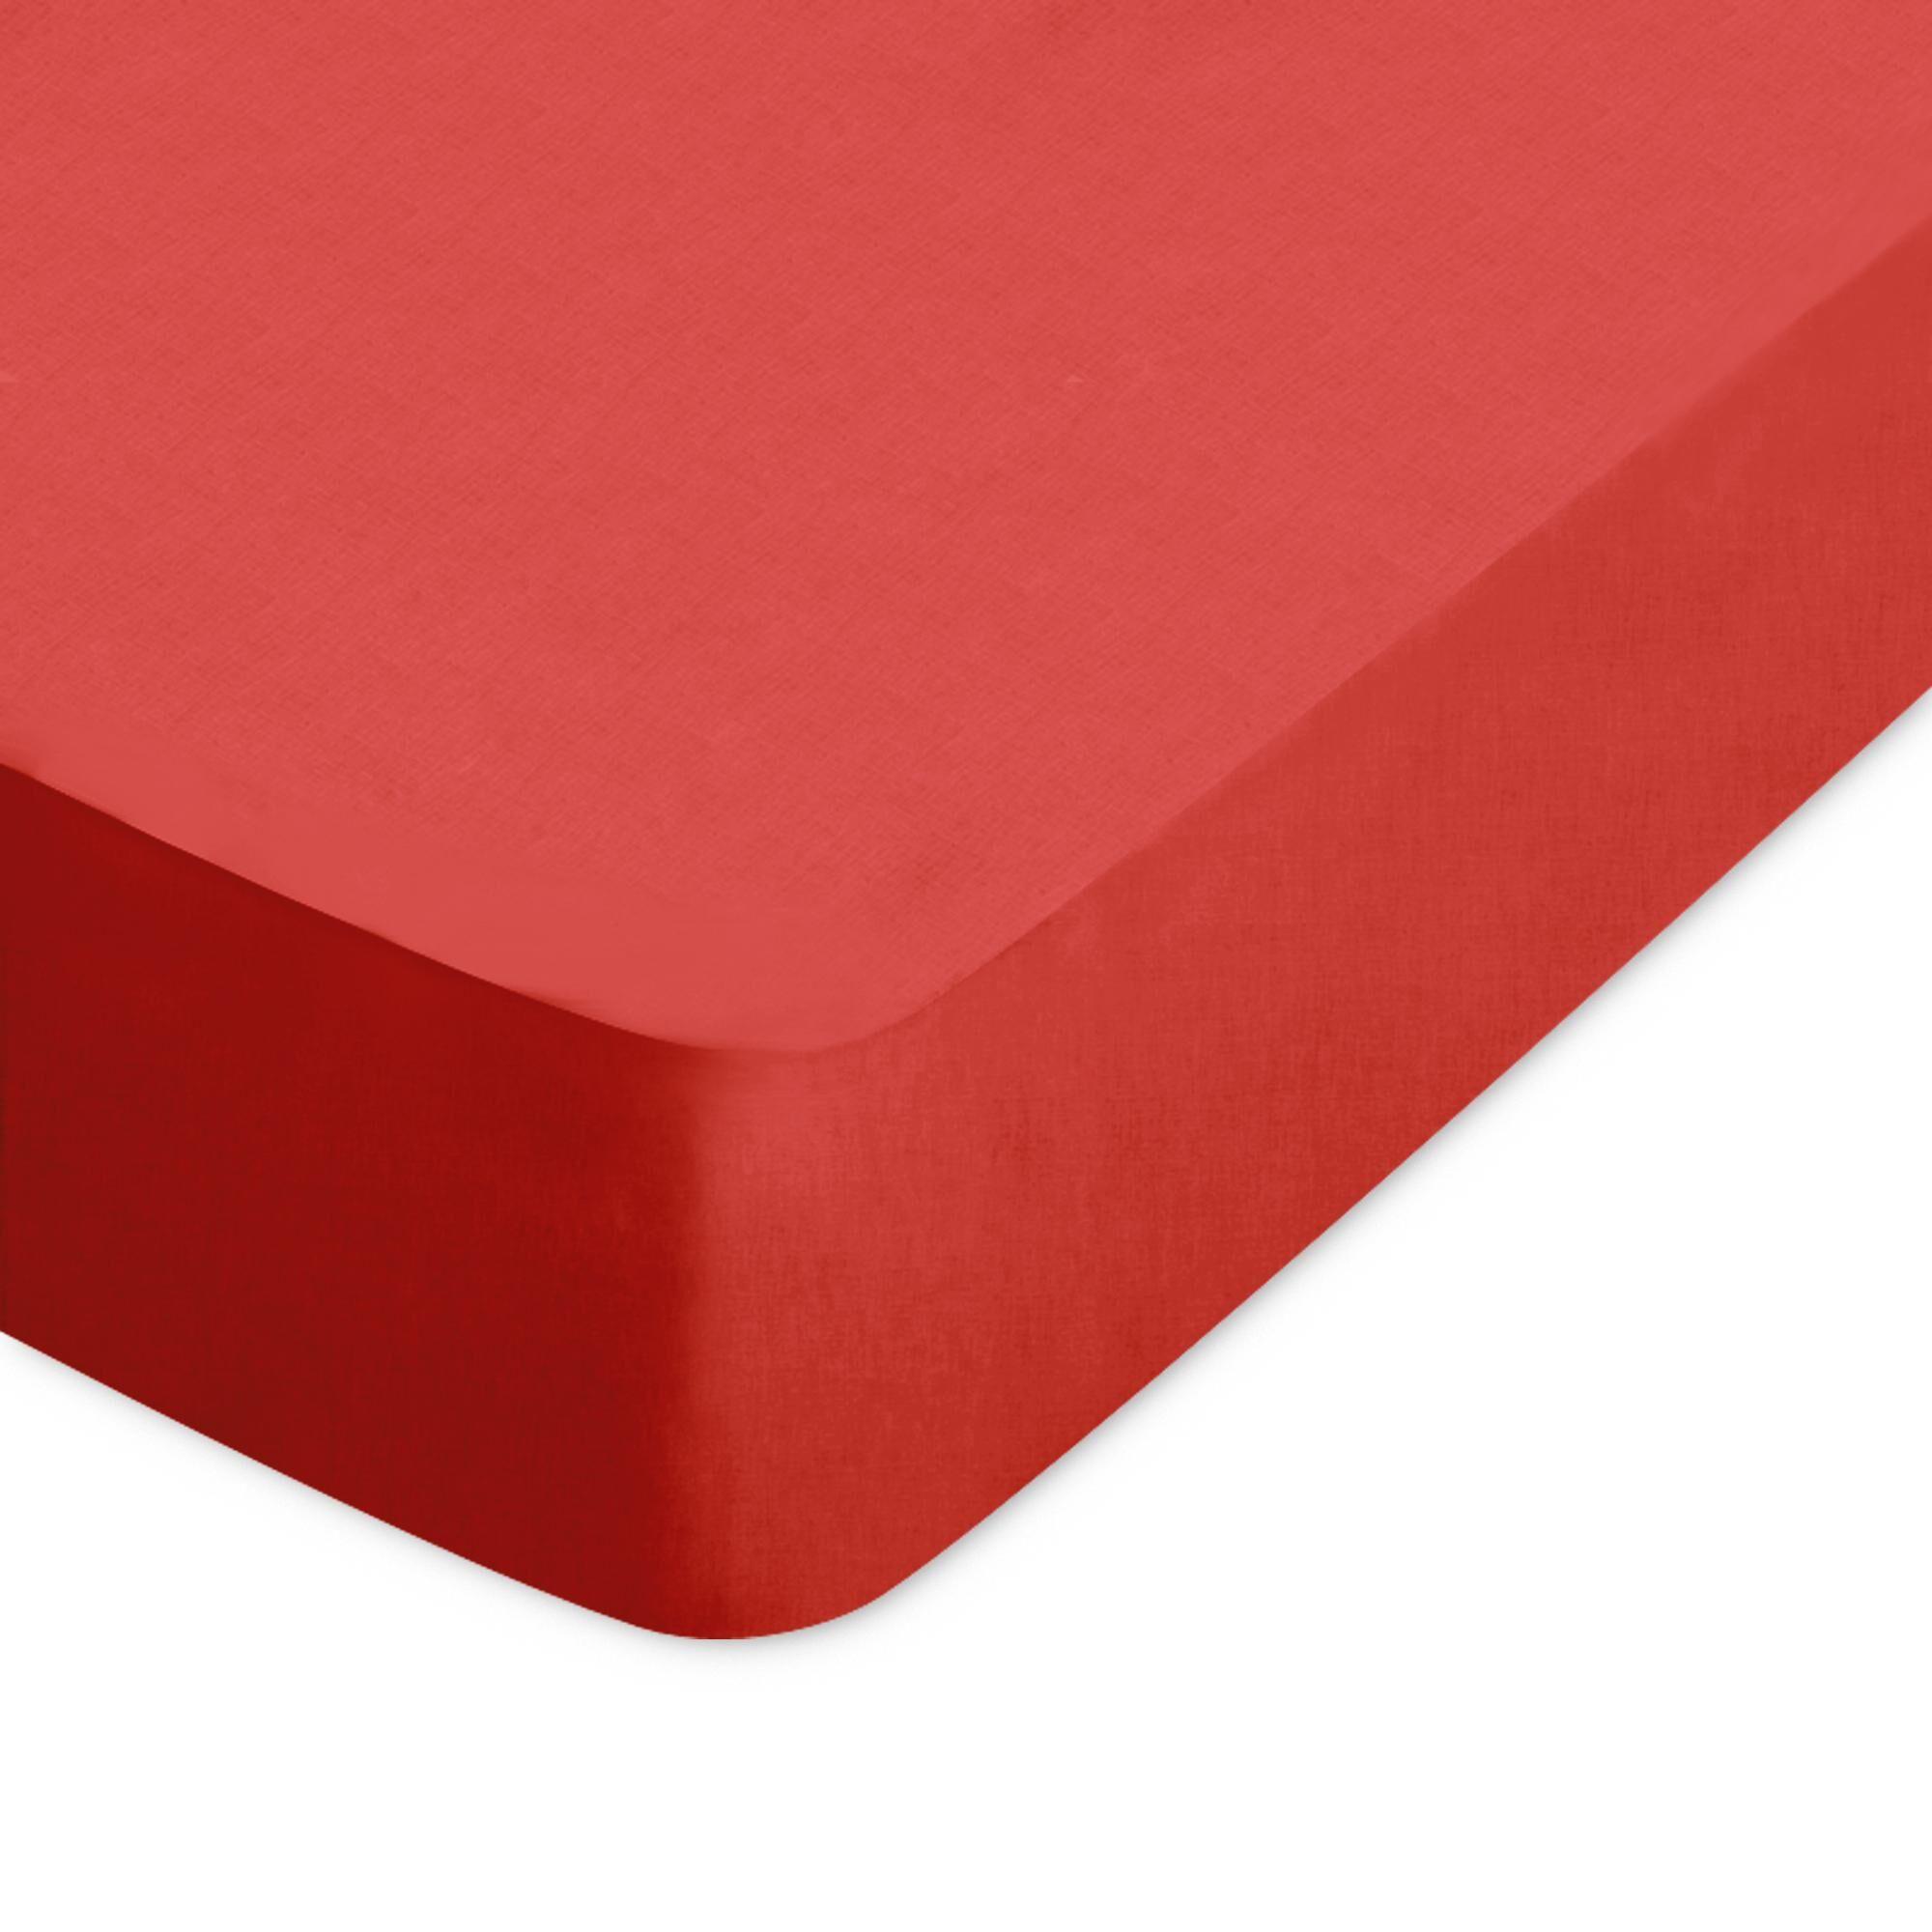 Linnea Drap housse uni 220x210 cm 100% coton ALTO orange Baie de Goji